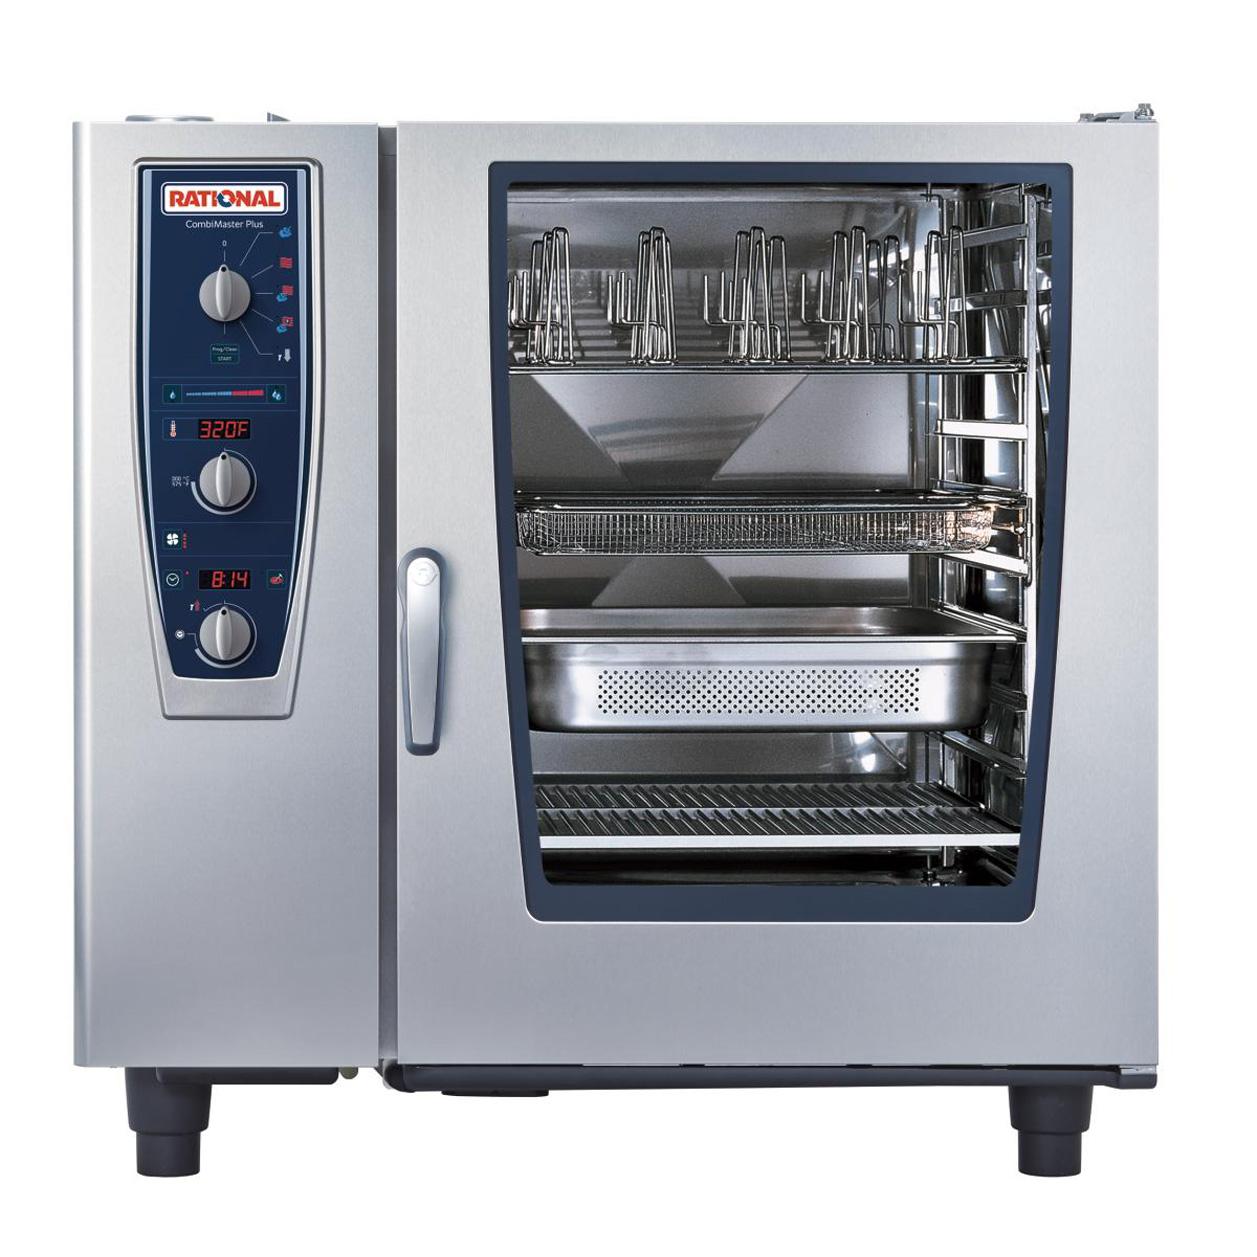 RATIONAL B129206.19D202 combi oven, gas